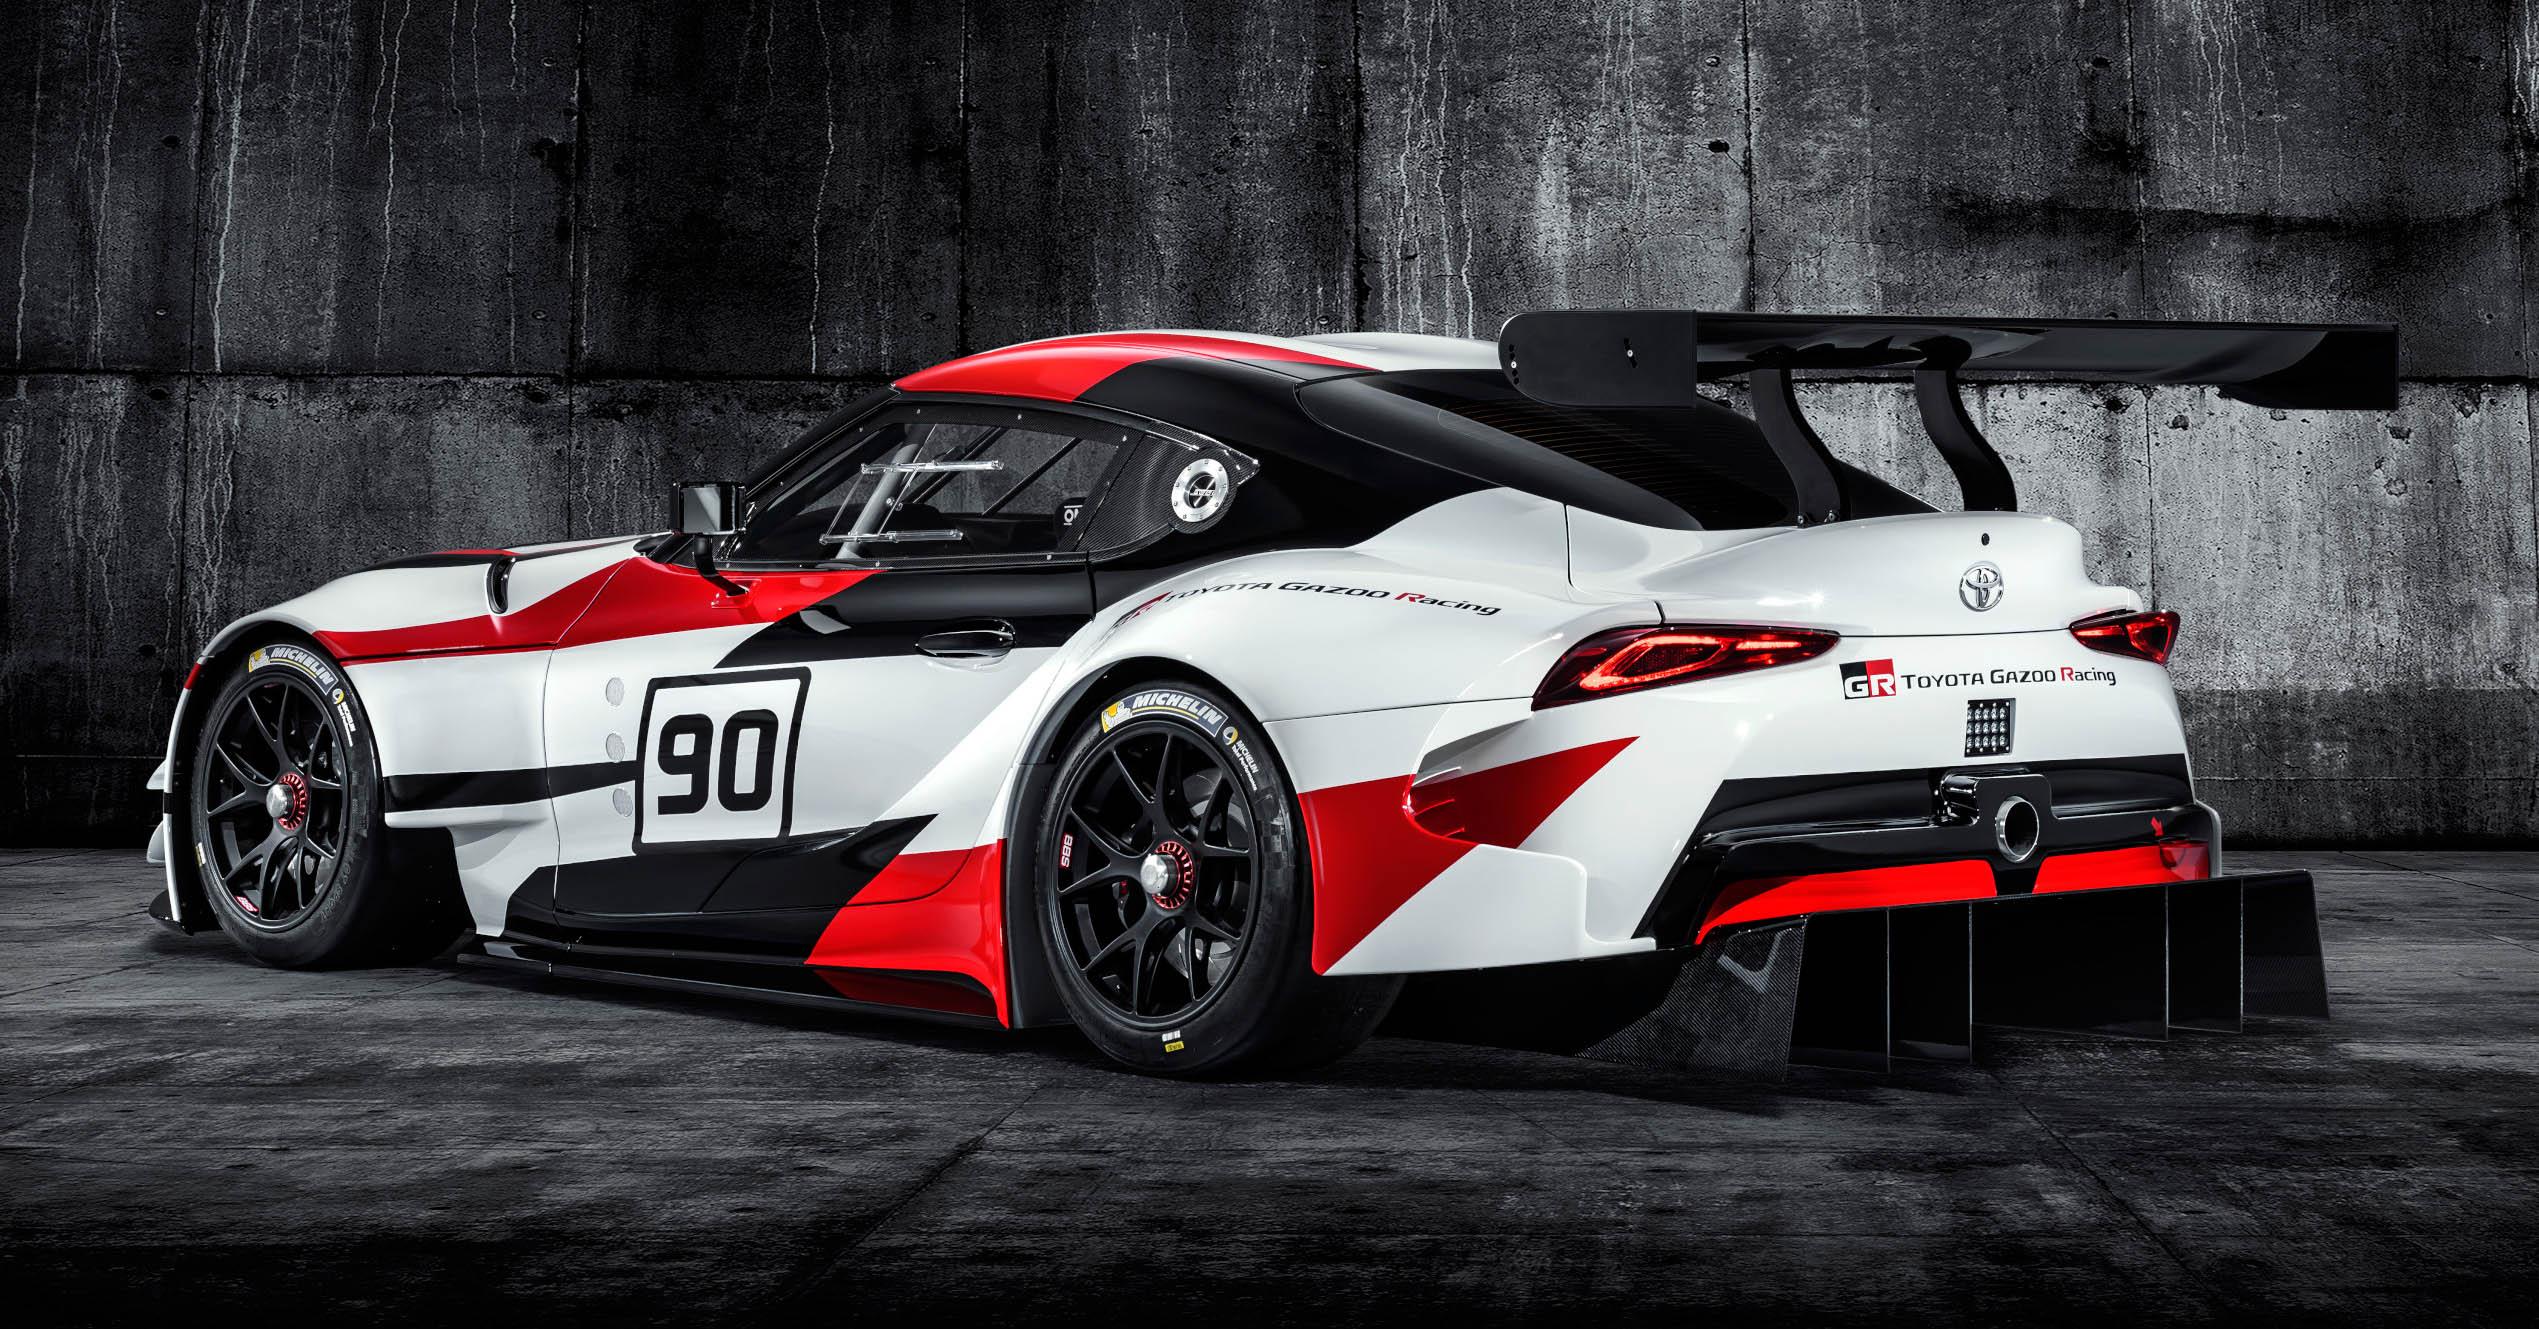 牛魔王传奇回归,toyota Gr Supra Racing Concept Toyota Gr Supra